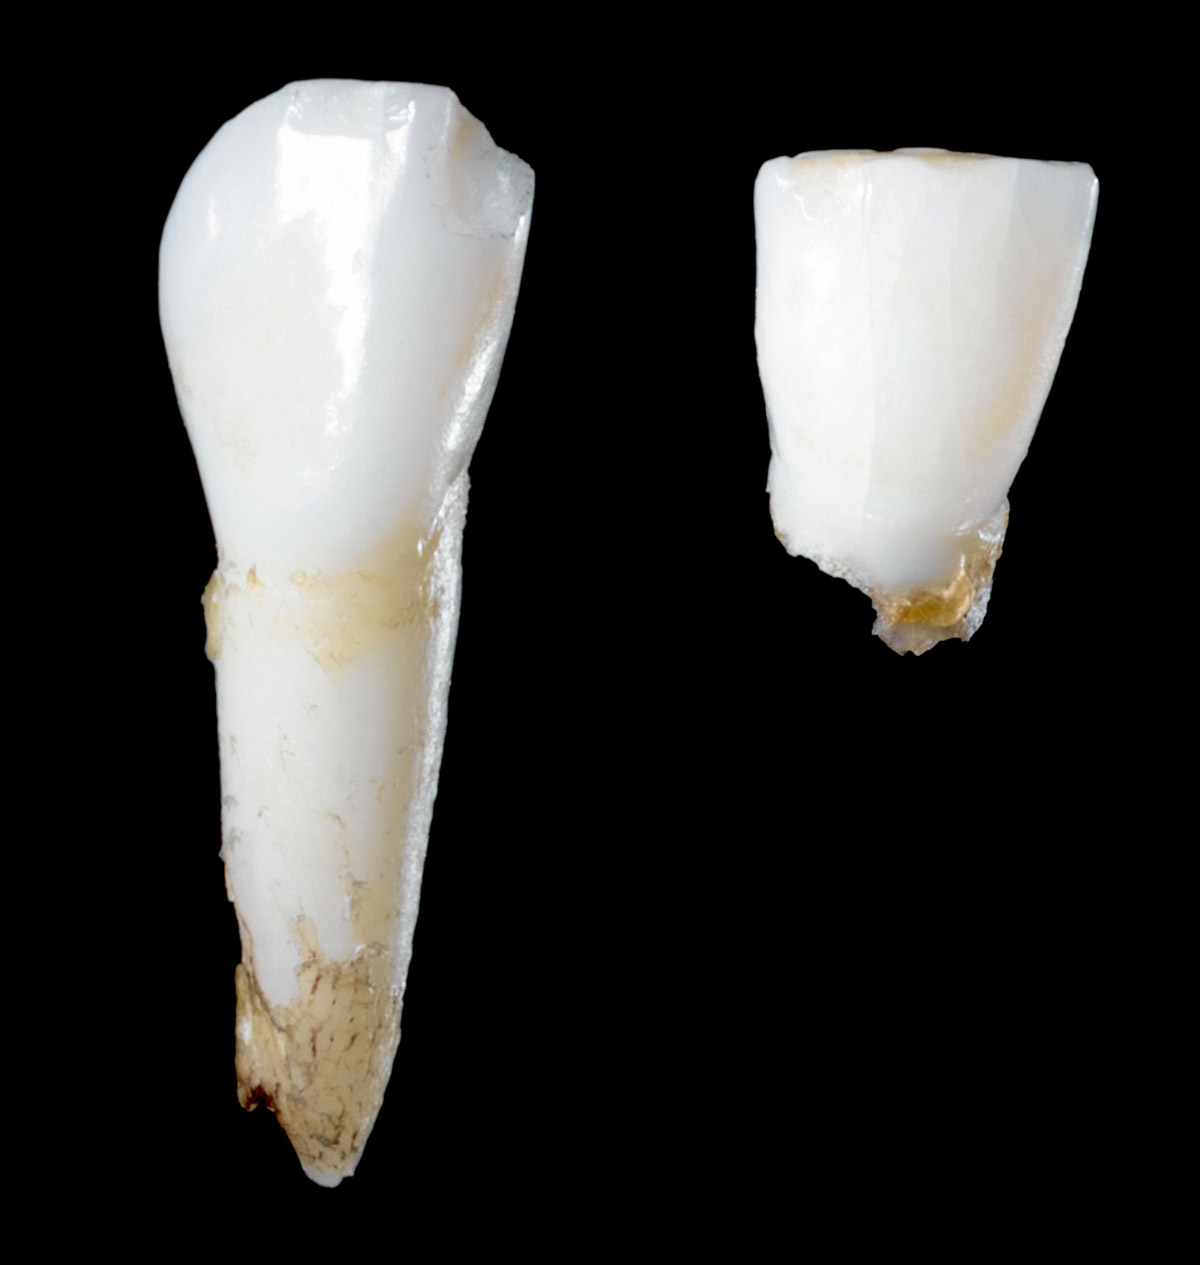 CABINET / Leftovers / Where Do Teeth Go?